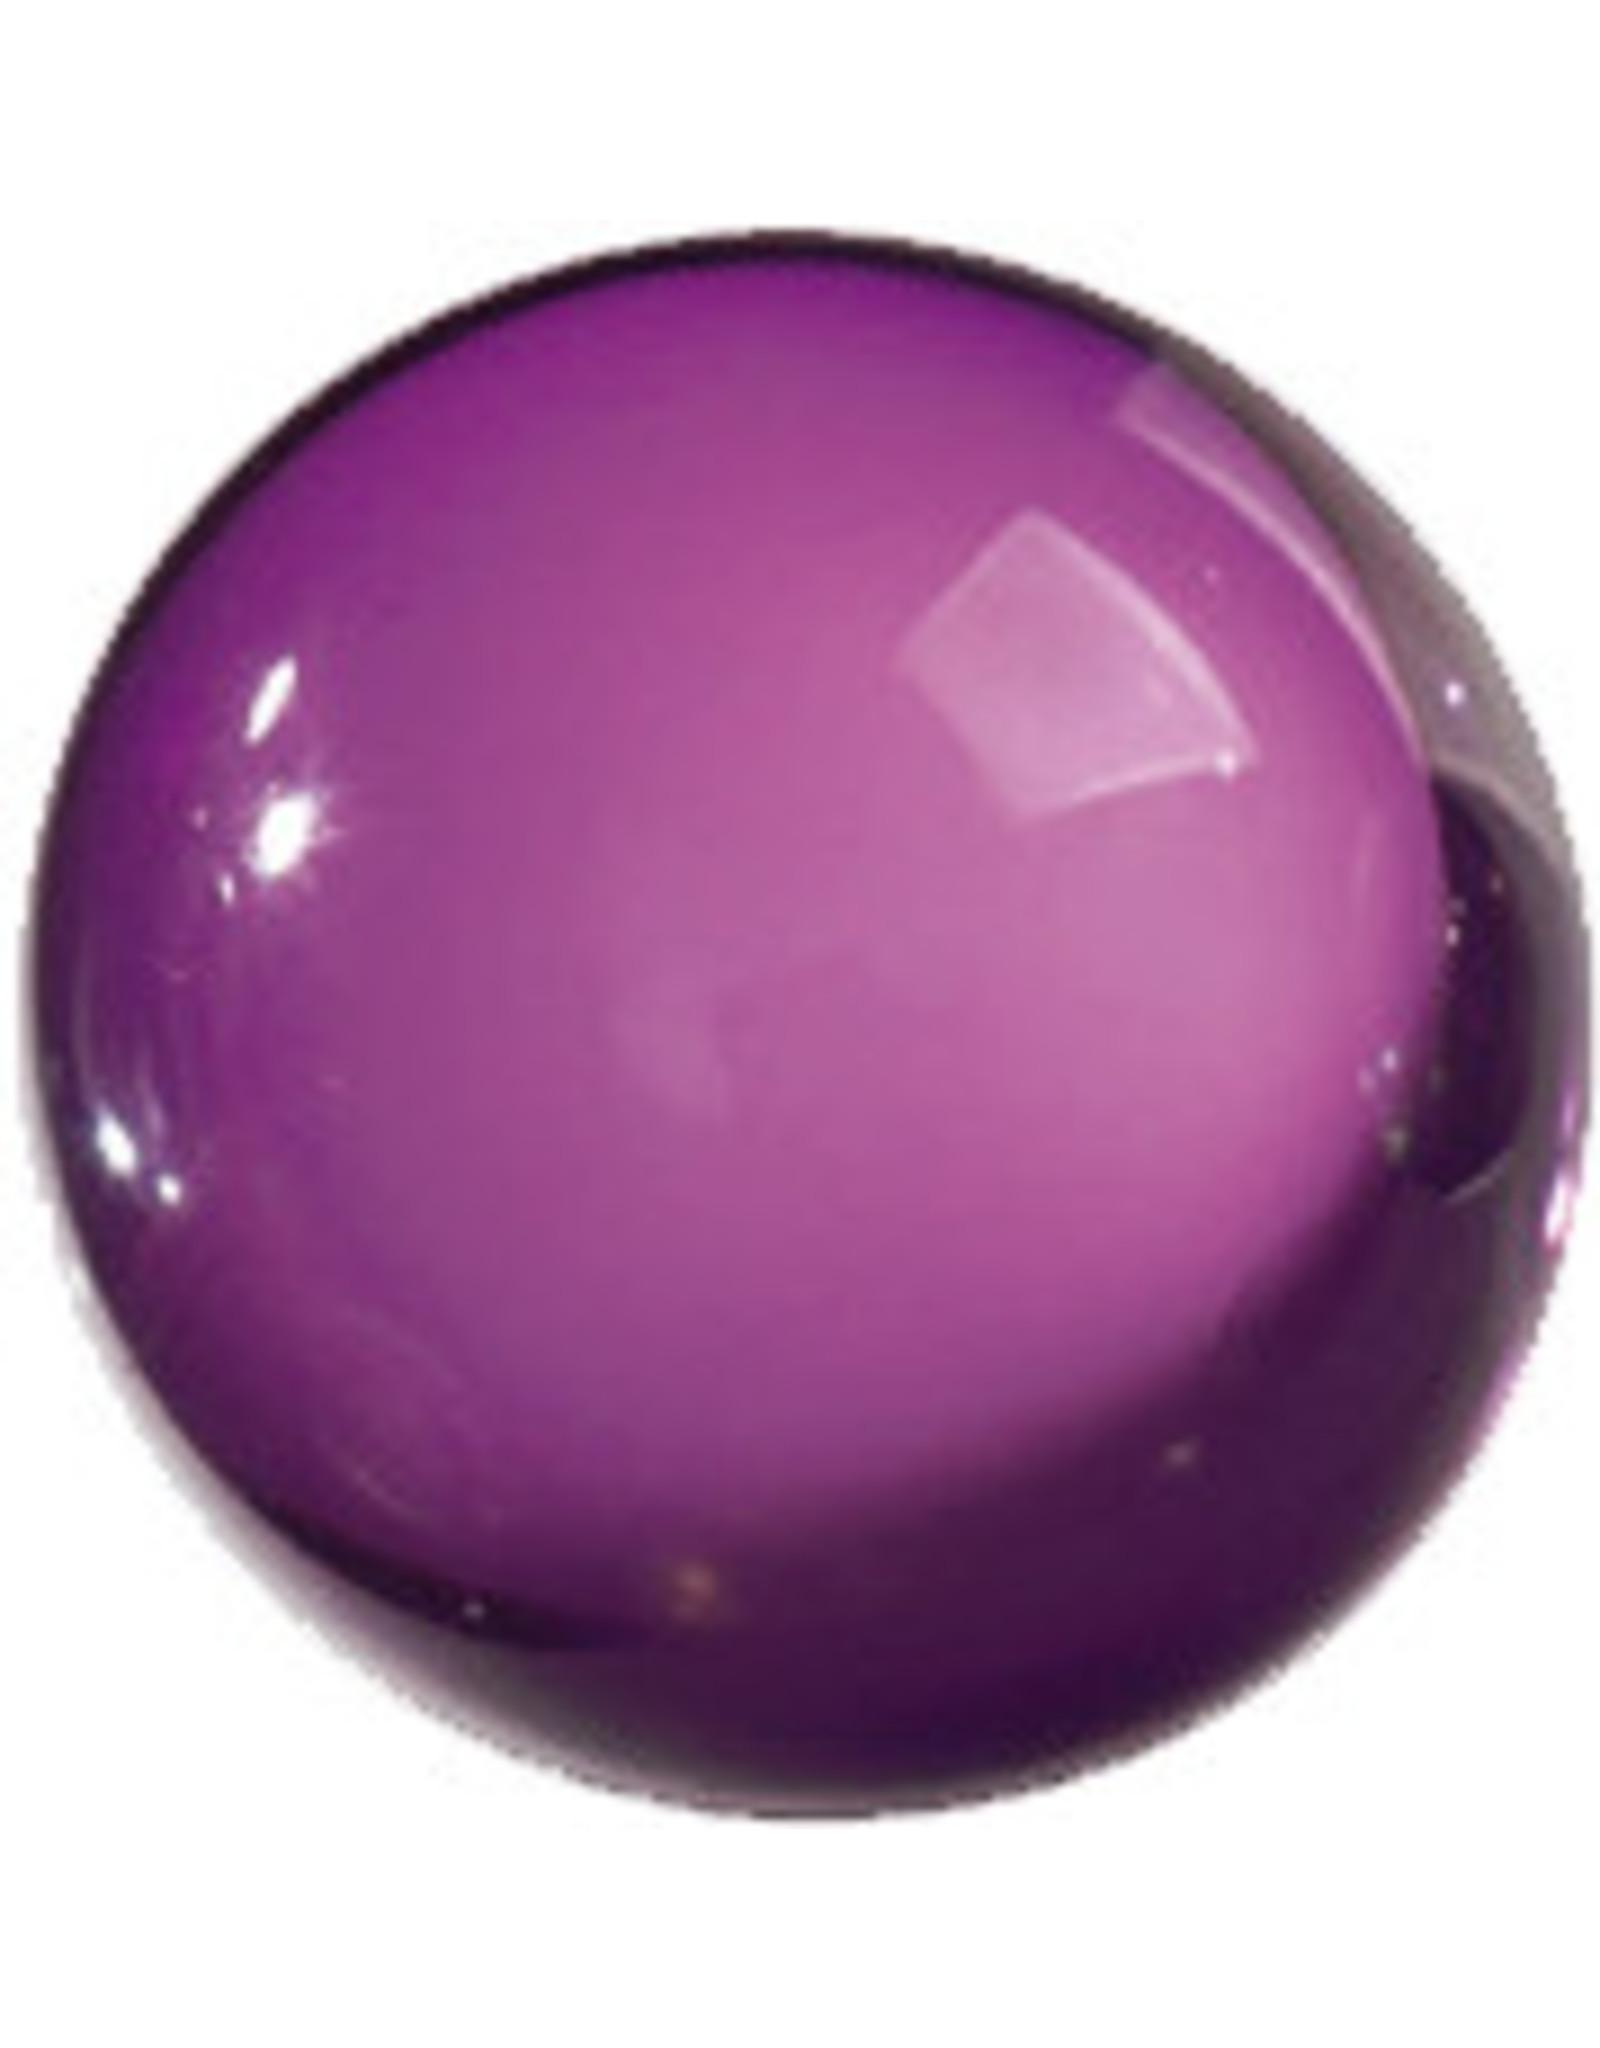 Badparel (violet) transparant - Body & Soap